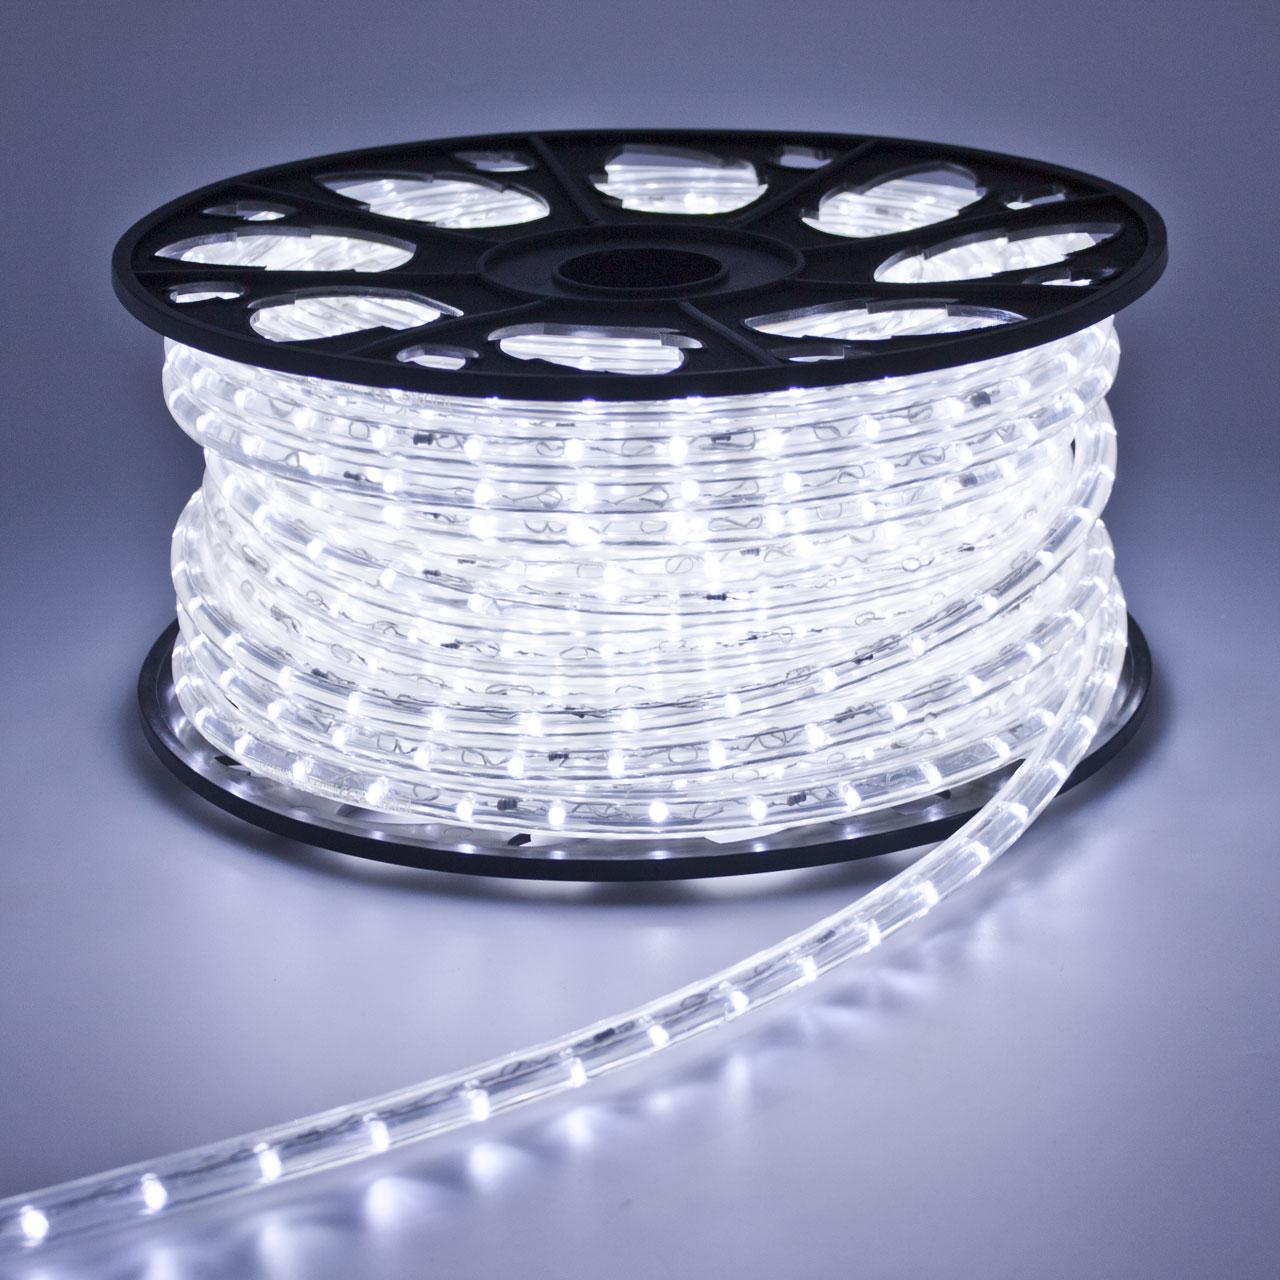 Noleggio luci tubo luminoso led bianco freddo a milano for Tubi luminosi led